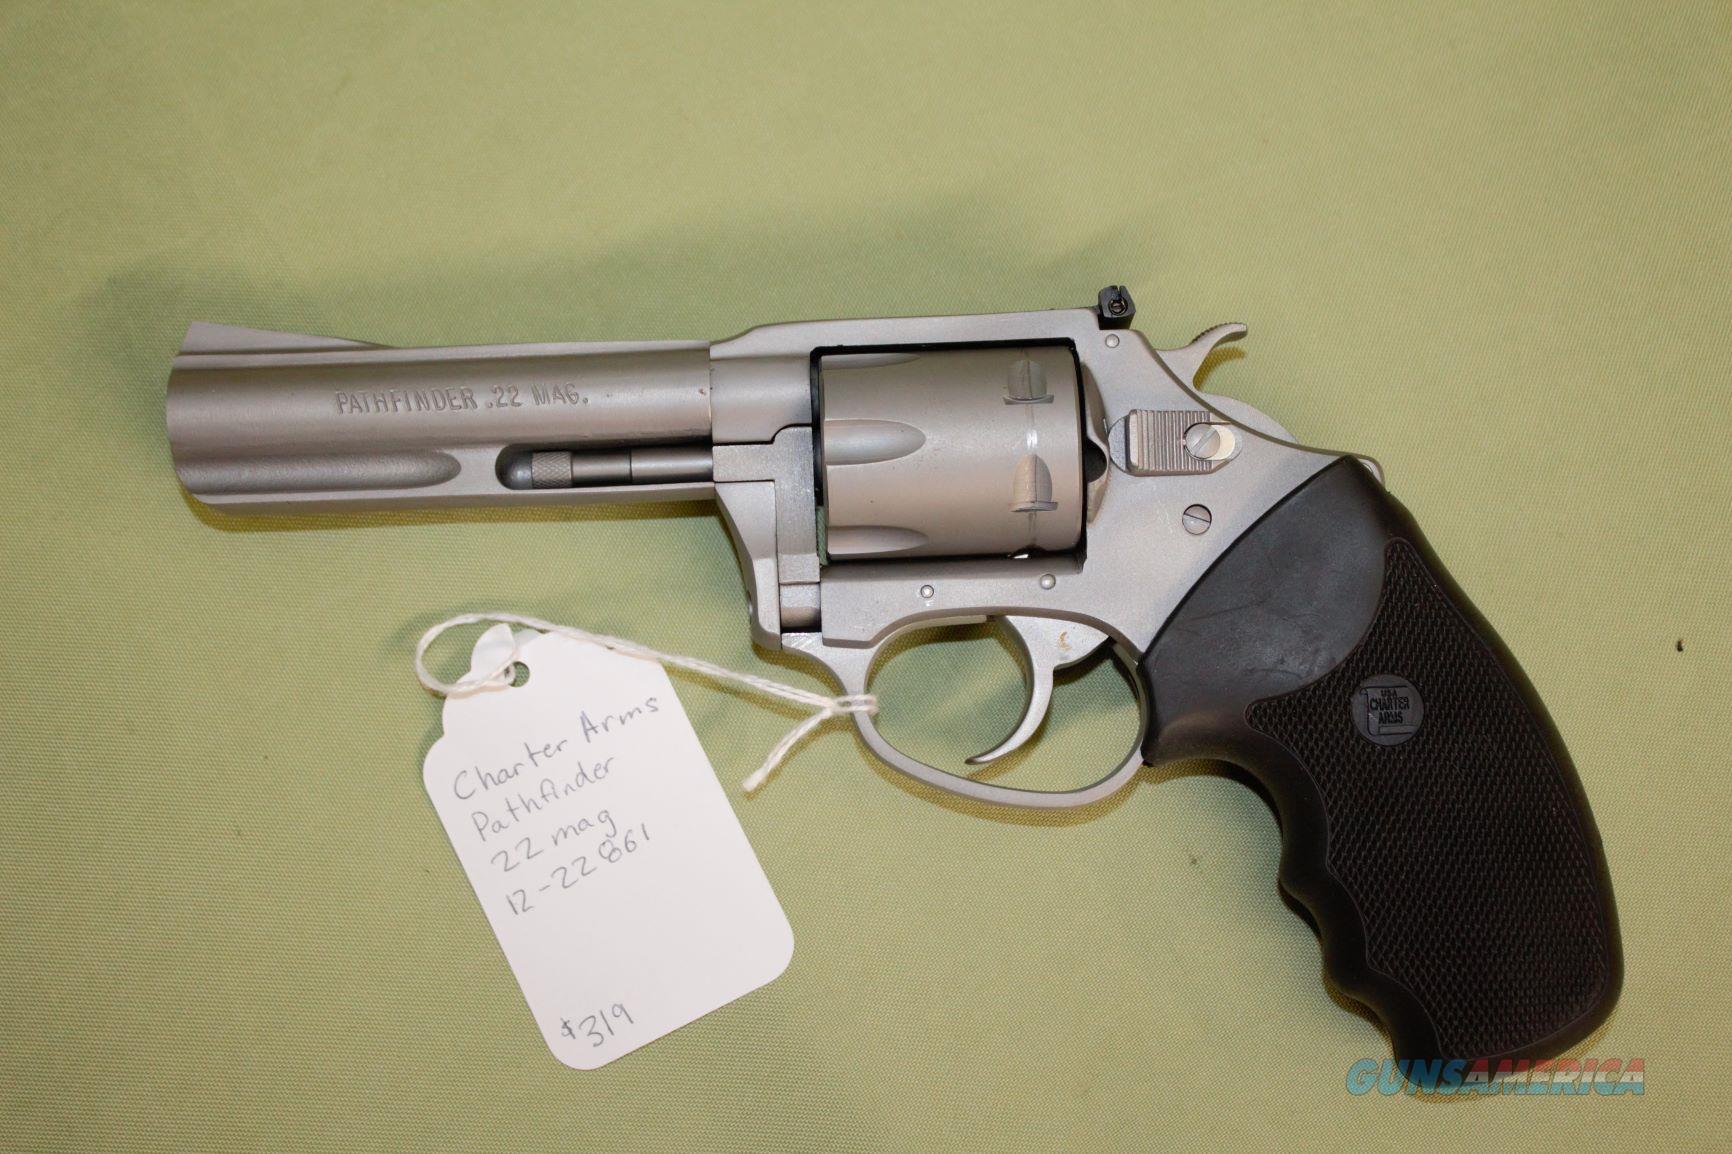 Charter Arms Pathfinder 22 Magnum  Guns > Pistols > Charter Arms Revolvers